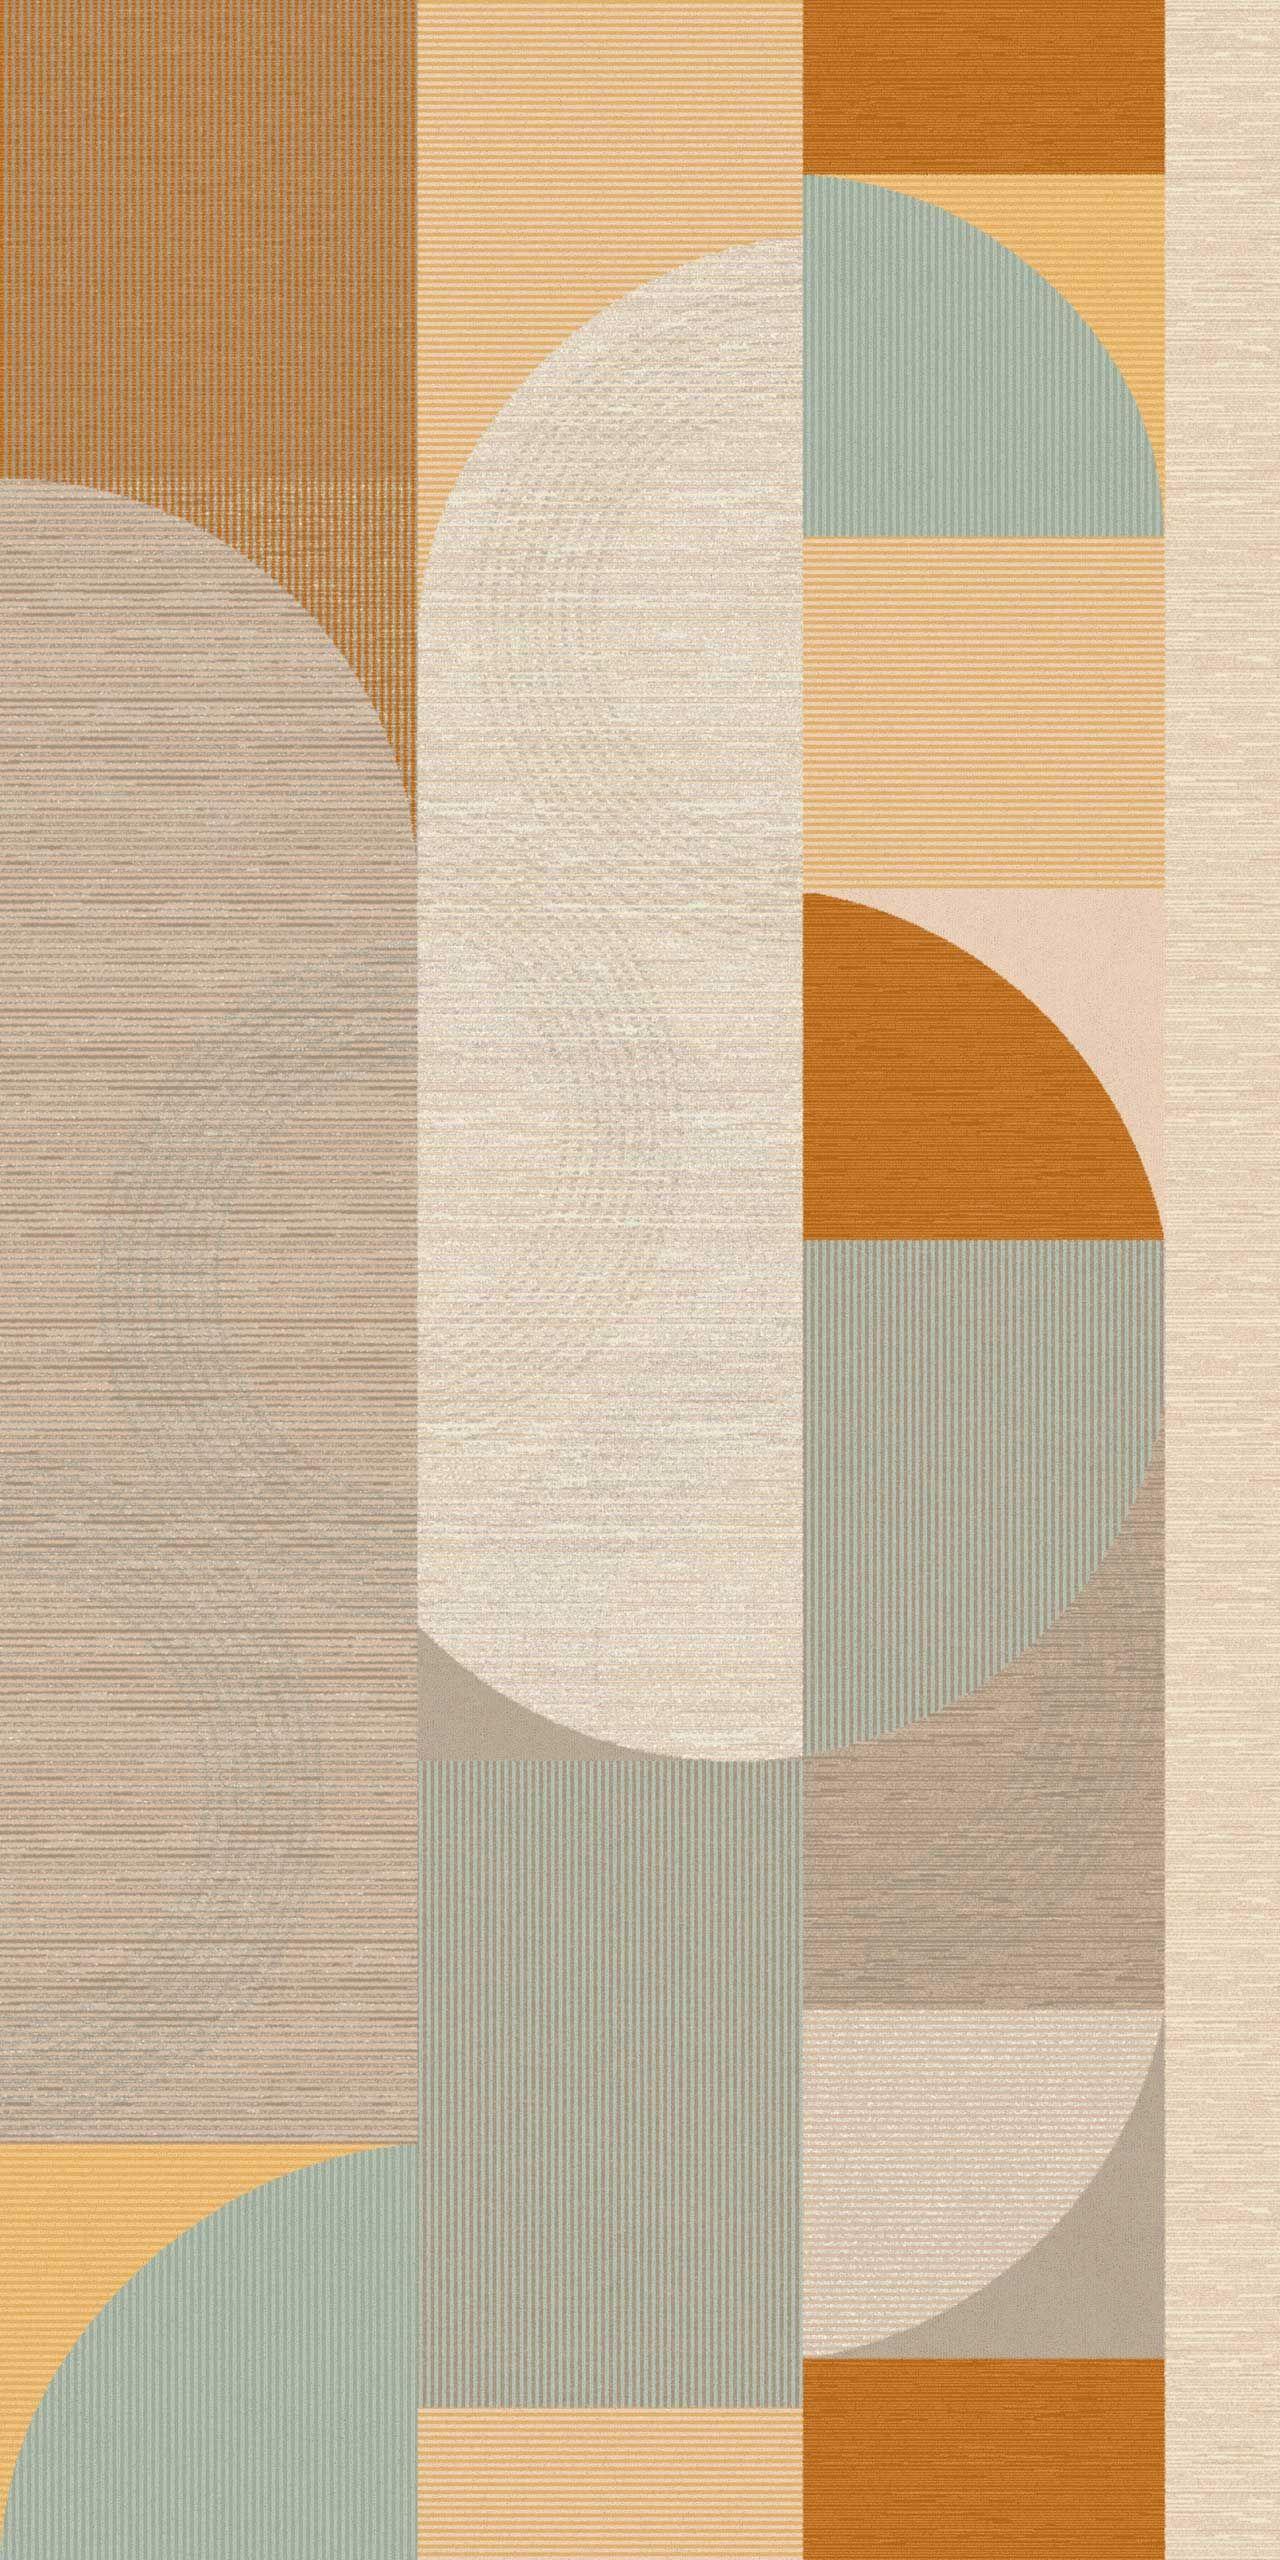 Tarkett Introduces nowHAUS: A Bauhaus-Inspired Flooring Collection - Design Milk